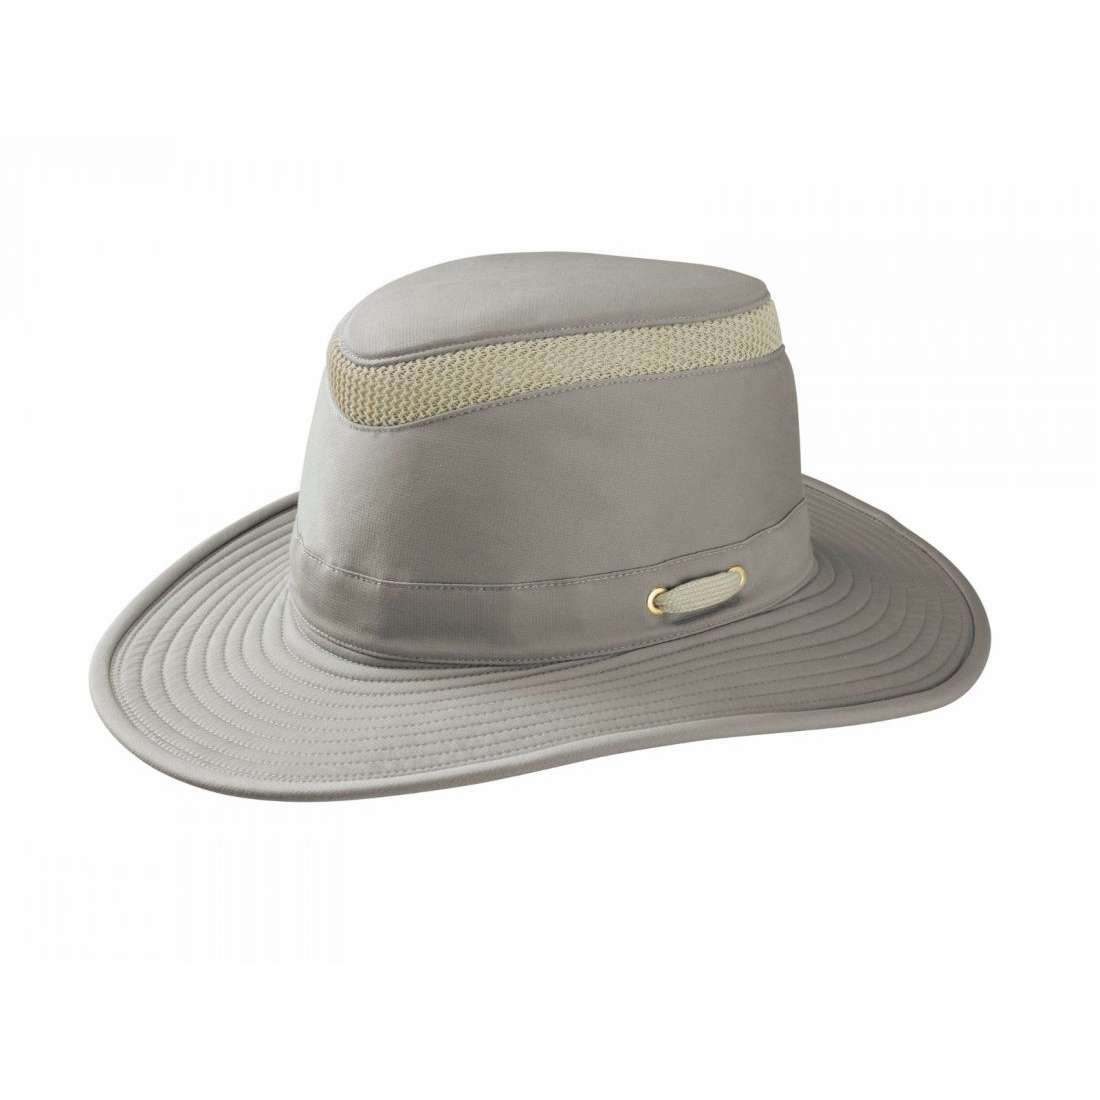 Tilley T4MO-1 Hiker s Hat cc0e9147ade